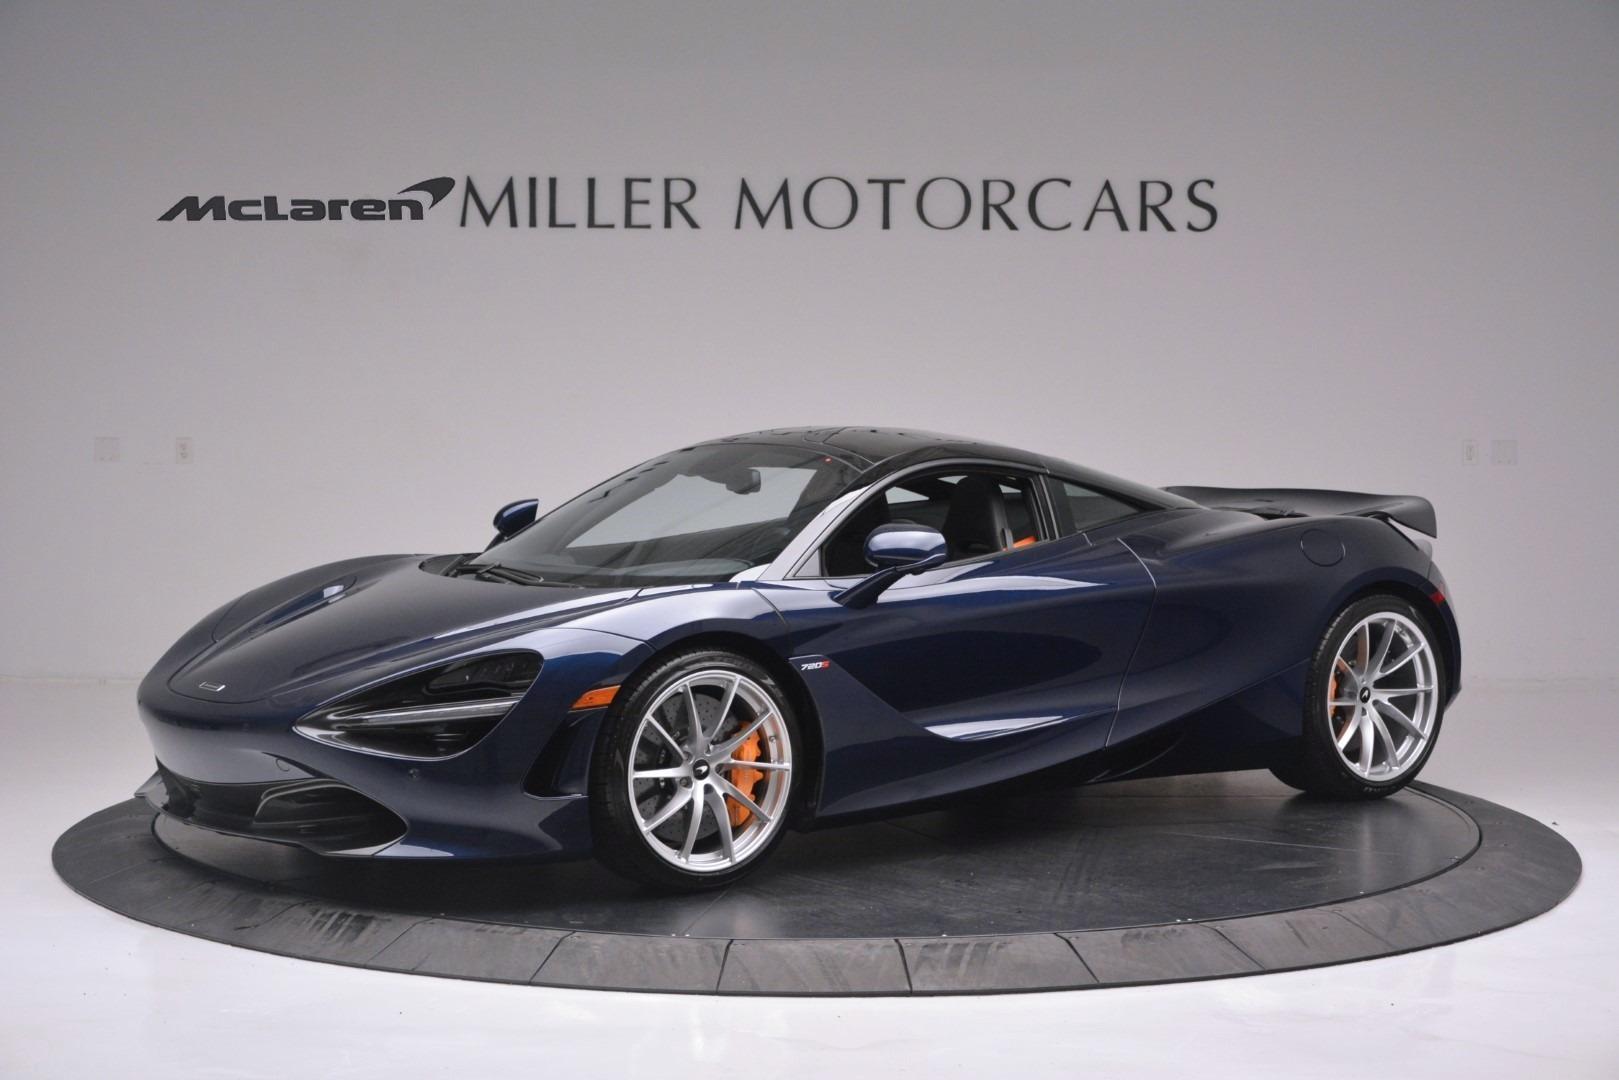 New 2019 McLaren 720S Coupe for sale $336,440 at Maserati of Westport in Westport CT 06880 1